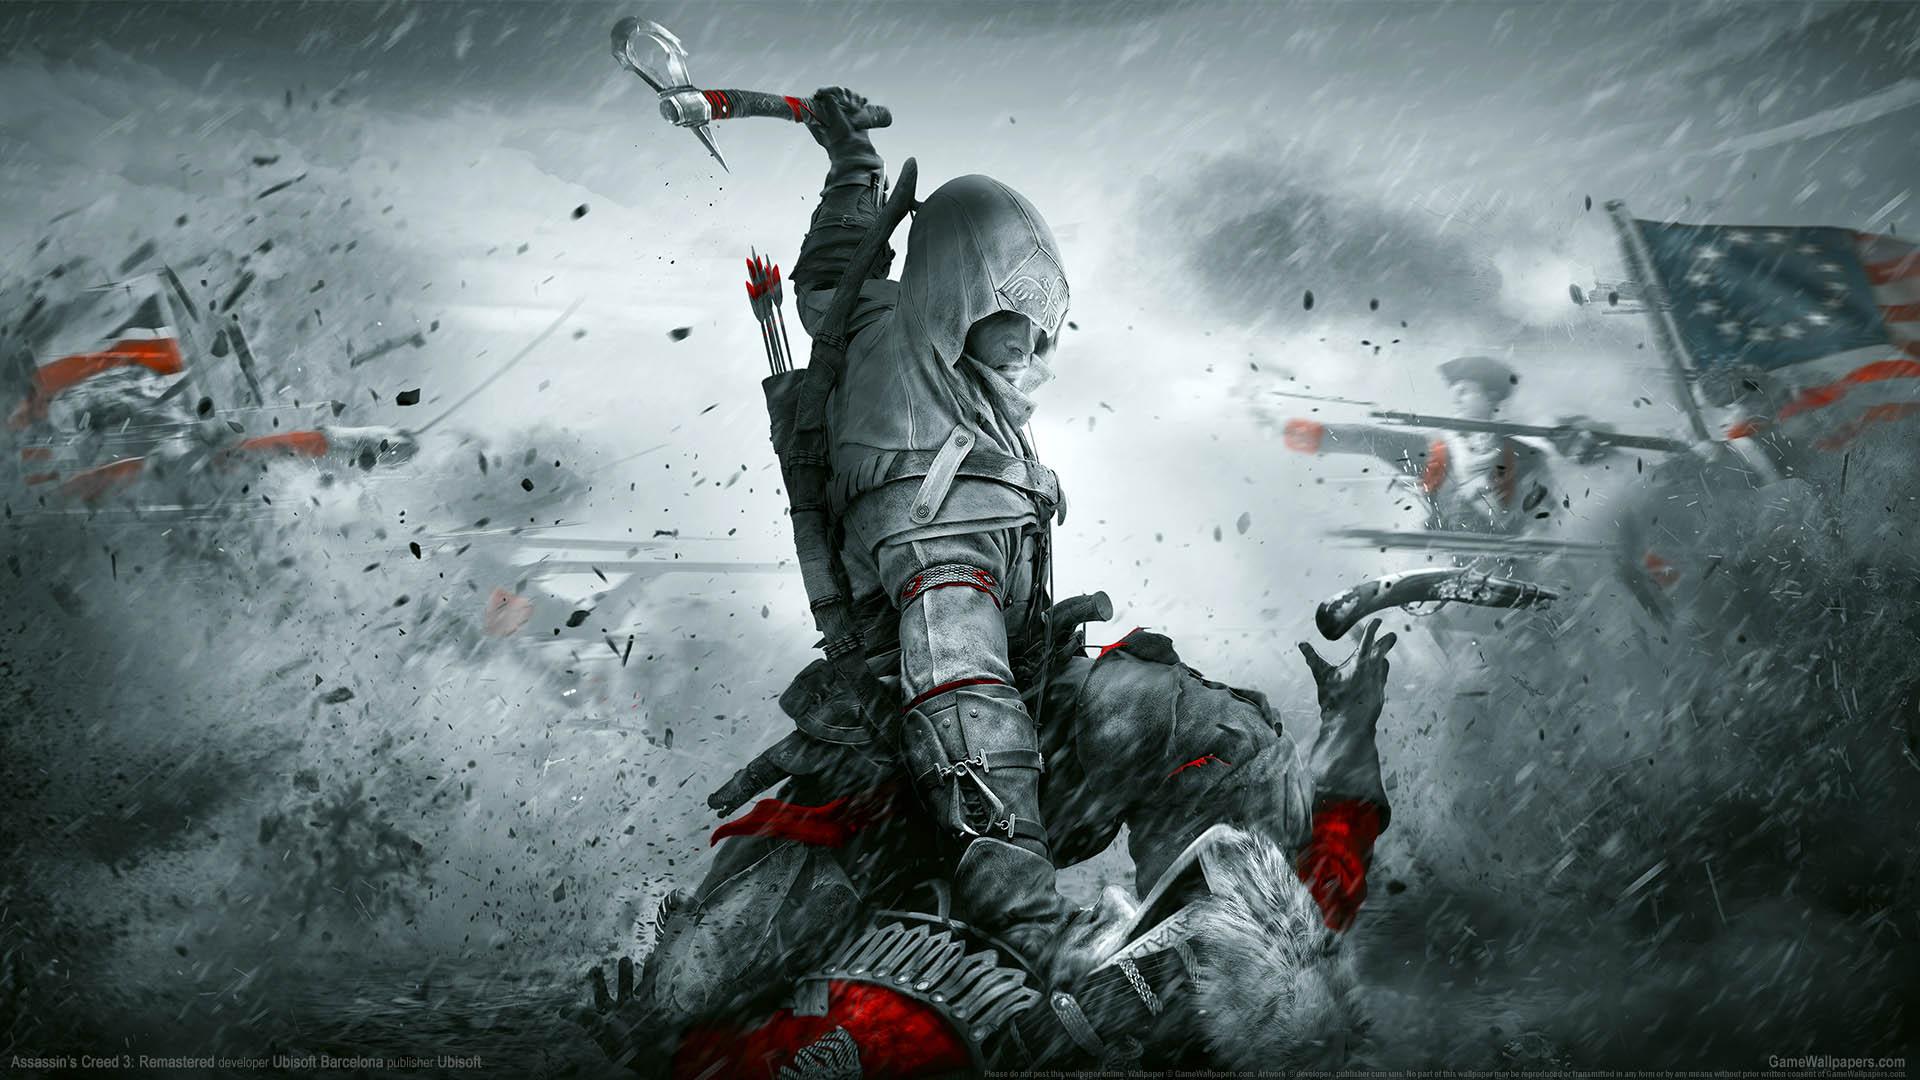 Assassin's Creed III: Remastered Hintergrundbild 01 1920x1080